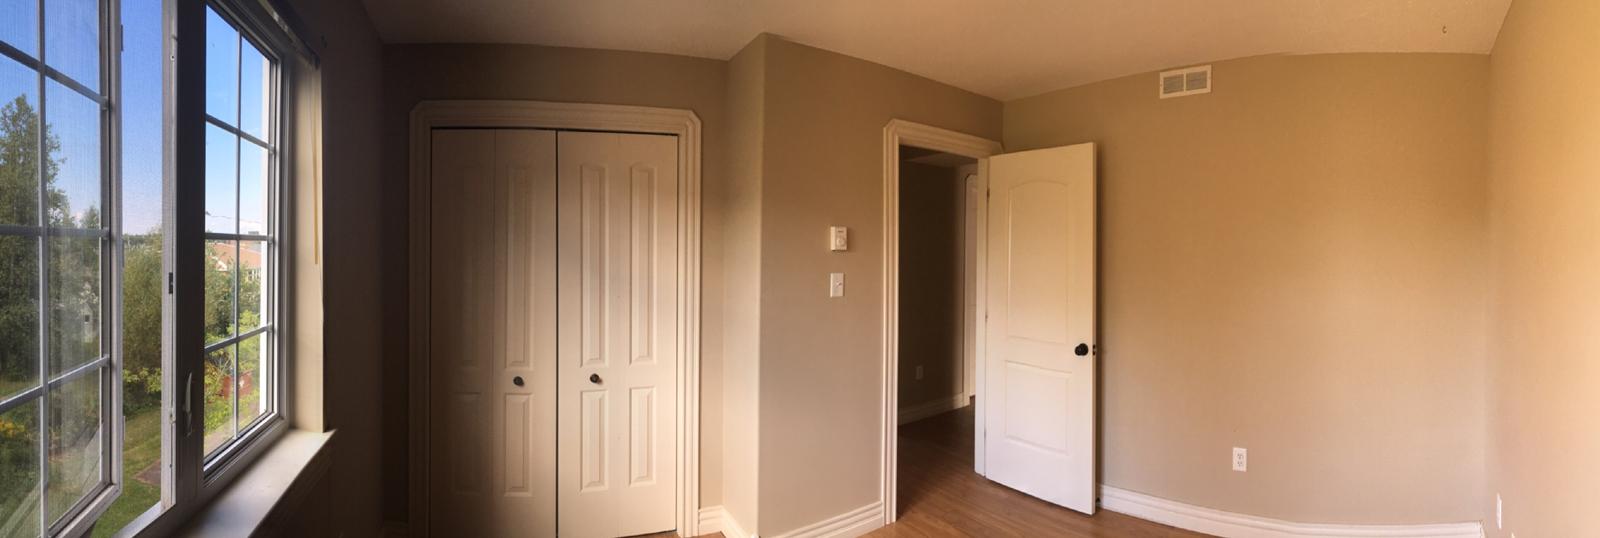 Alma Apartments For Rent